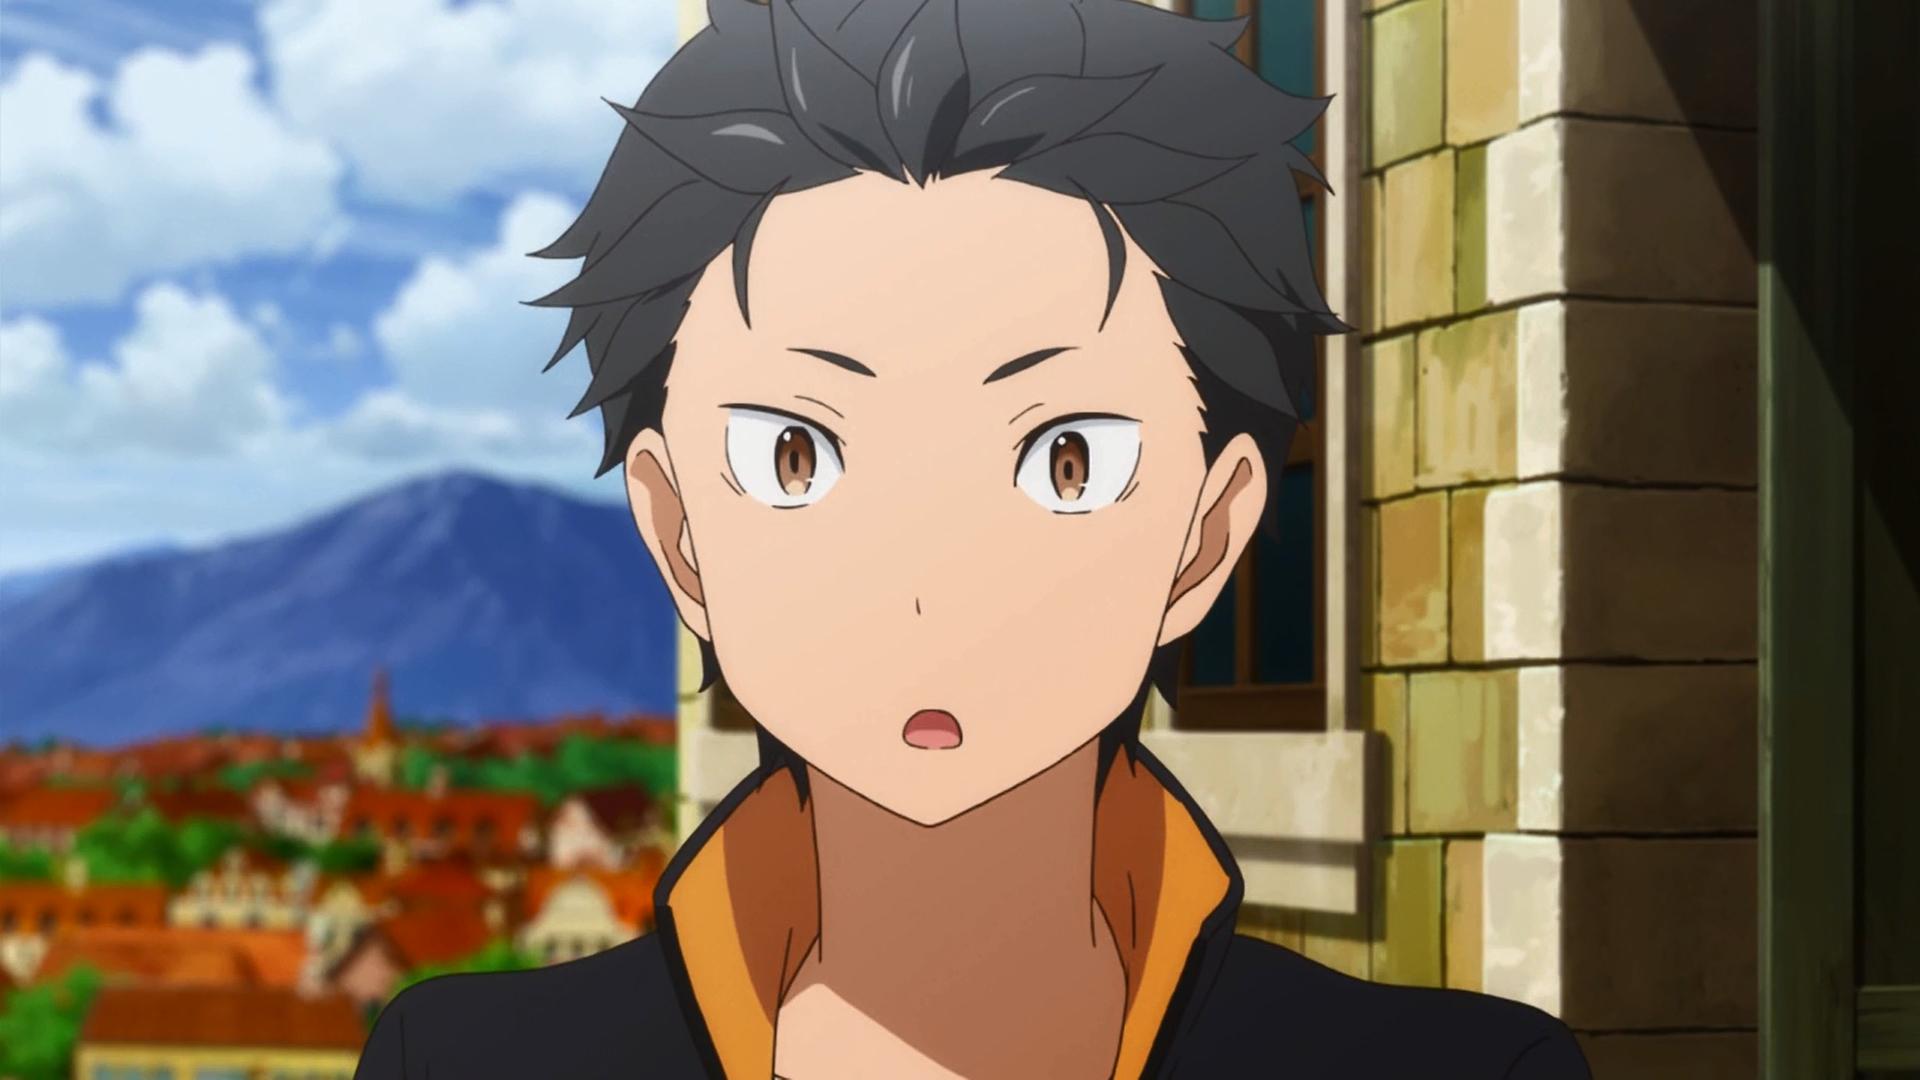 Natsuki Subaru Anime, Anime characters, Anime art